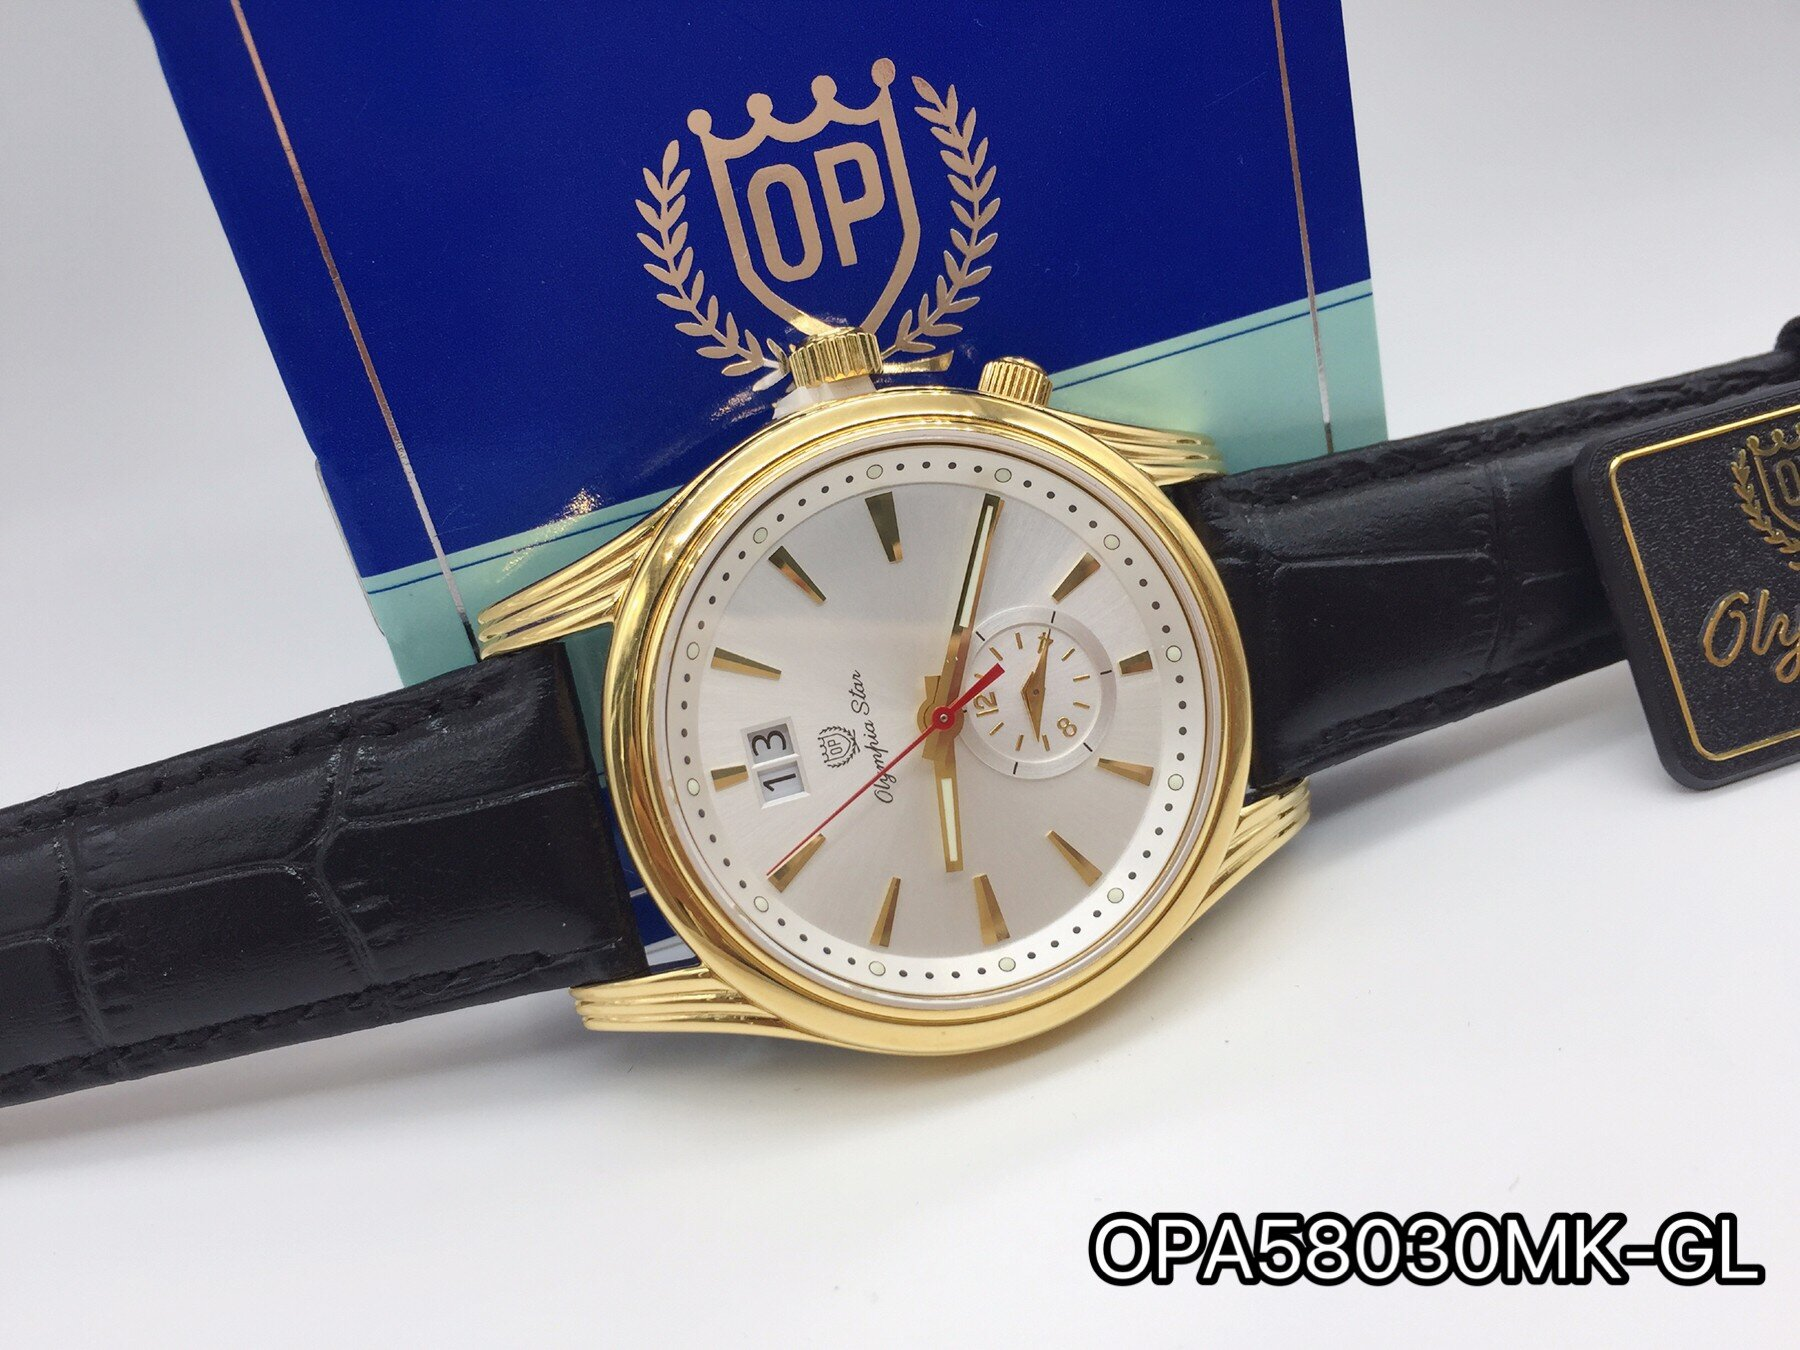 Đồng hồ nam dây da OLYMPIA STAR OPA58030MK - màu GL, GLD, GLV